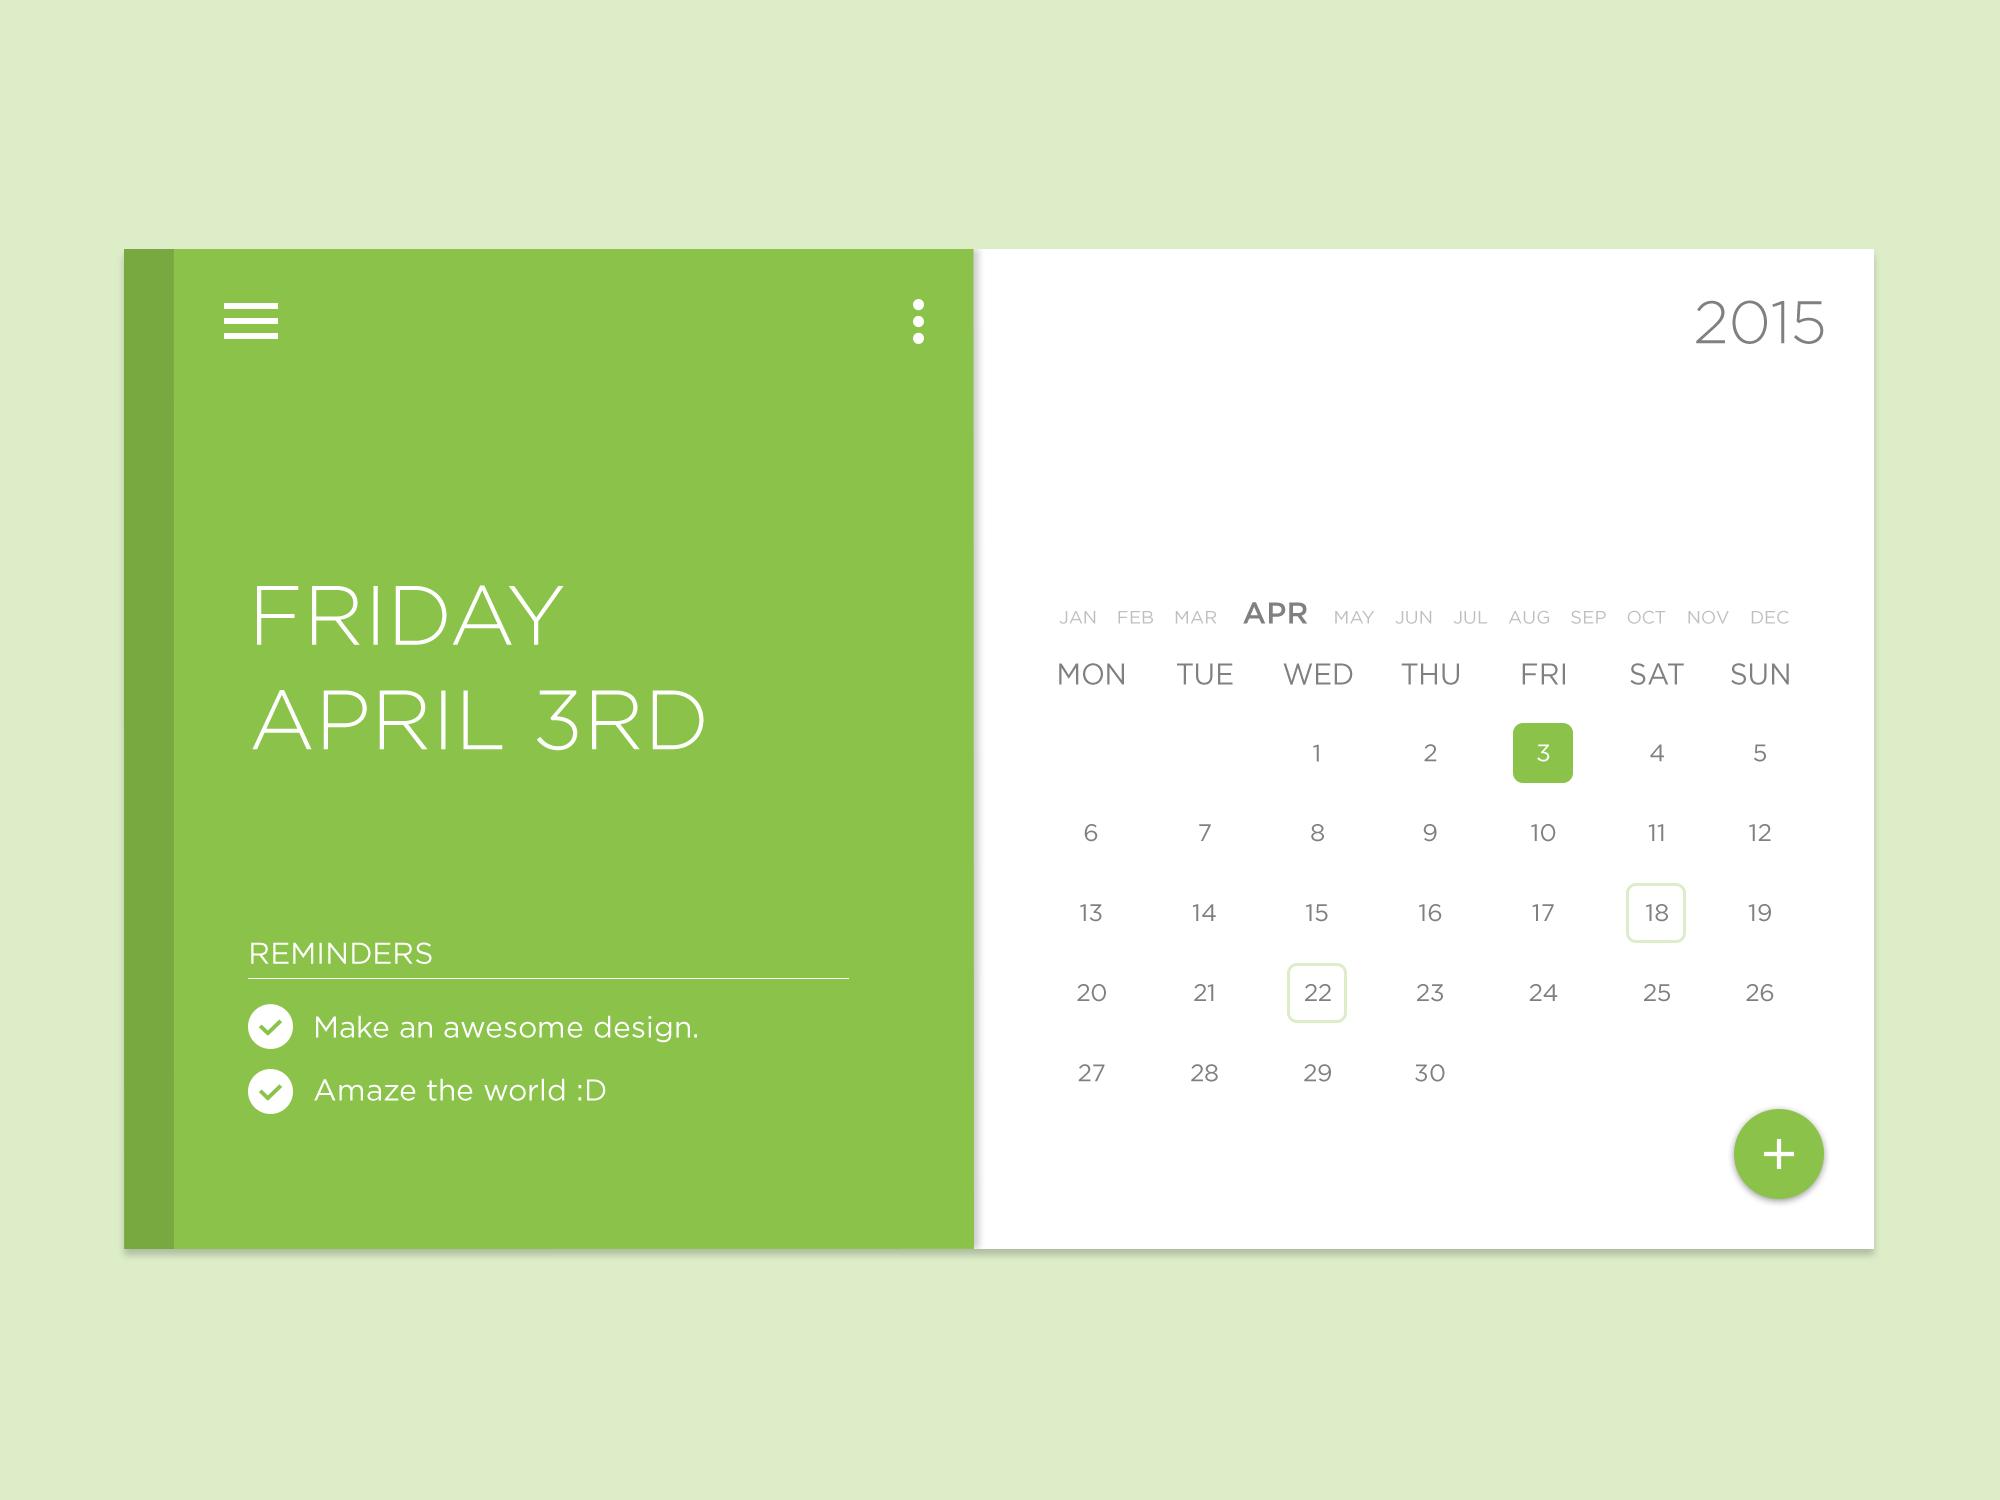 Calendar Material Design Javascript : Task calendar widget free psd download